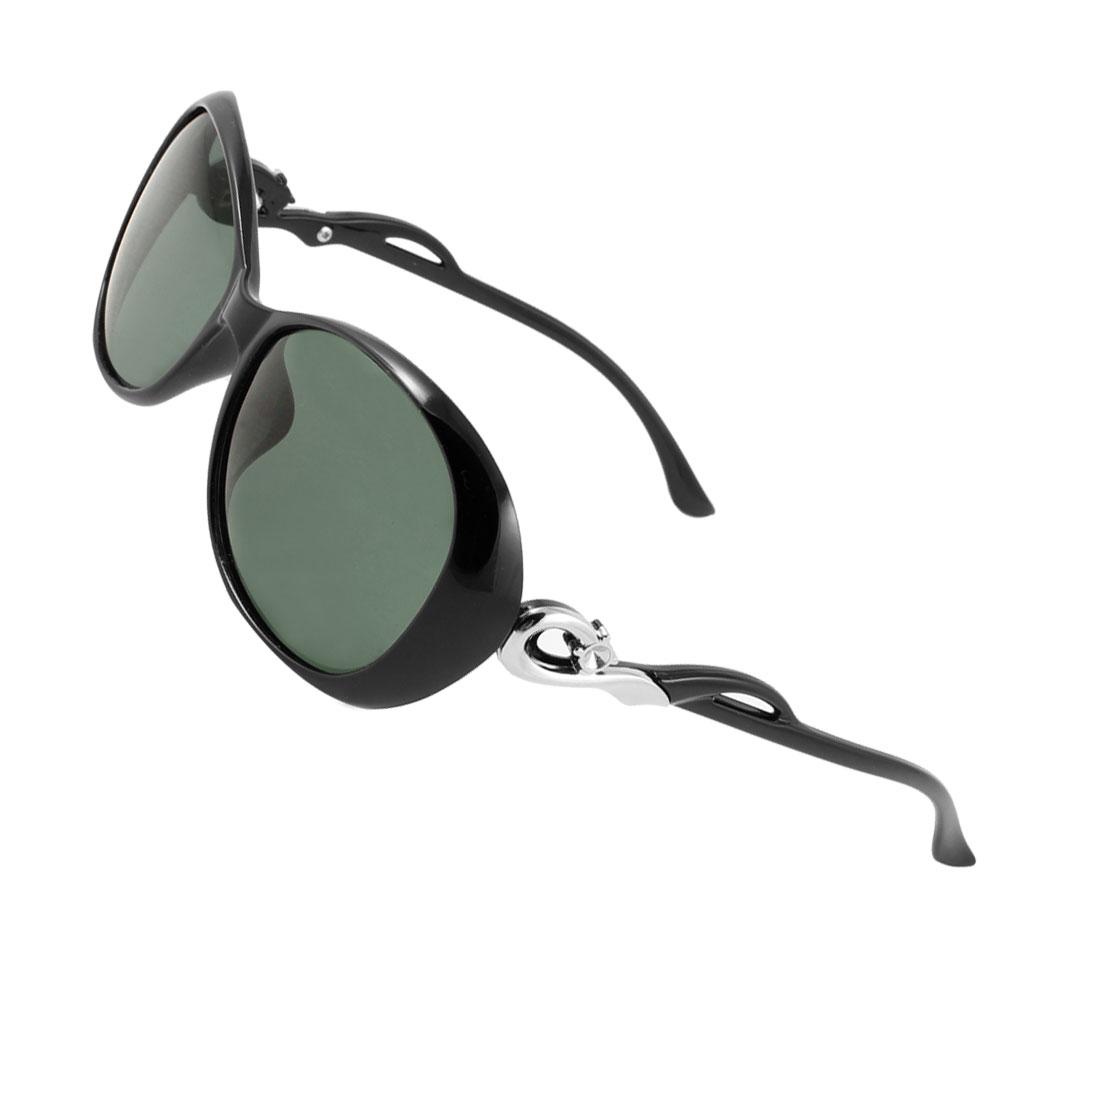 Lady Outdoor Sports Teardrop Shape Lens Eyeglasses Polarized Sunglasses Black